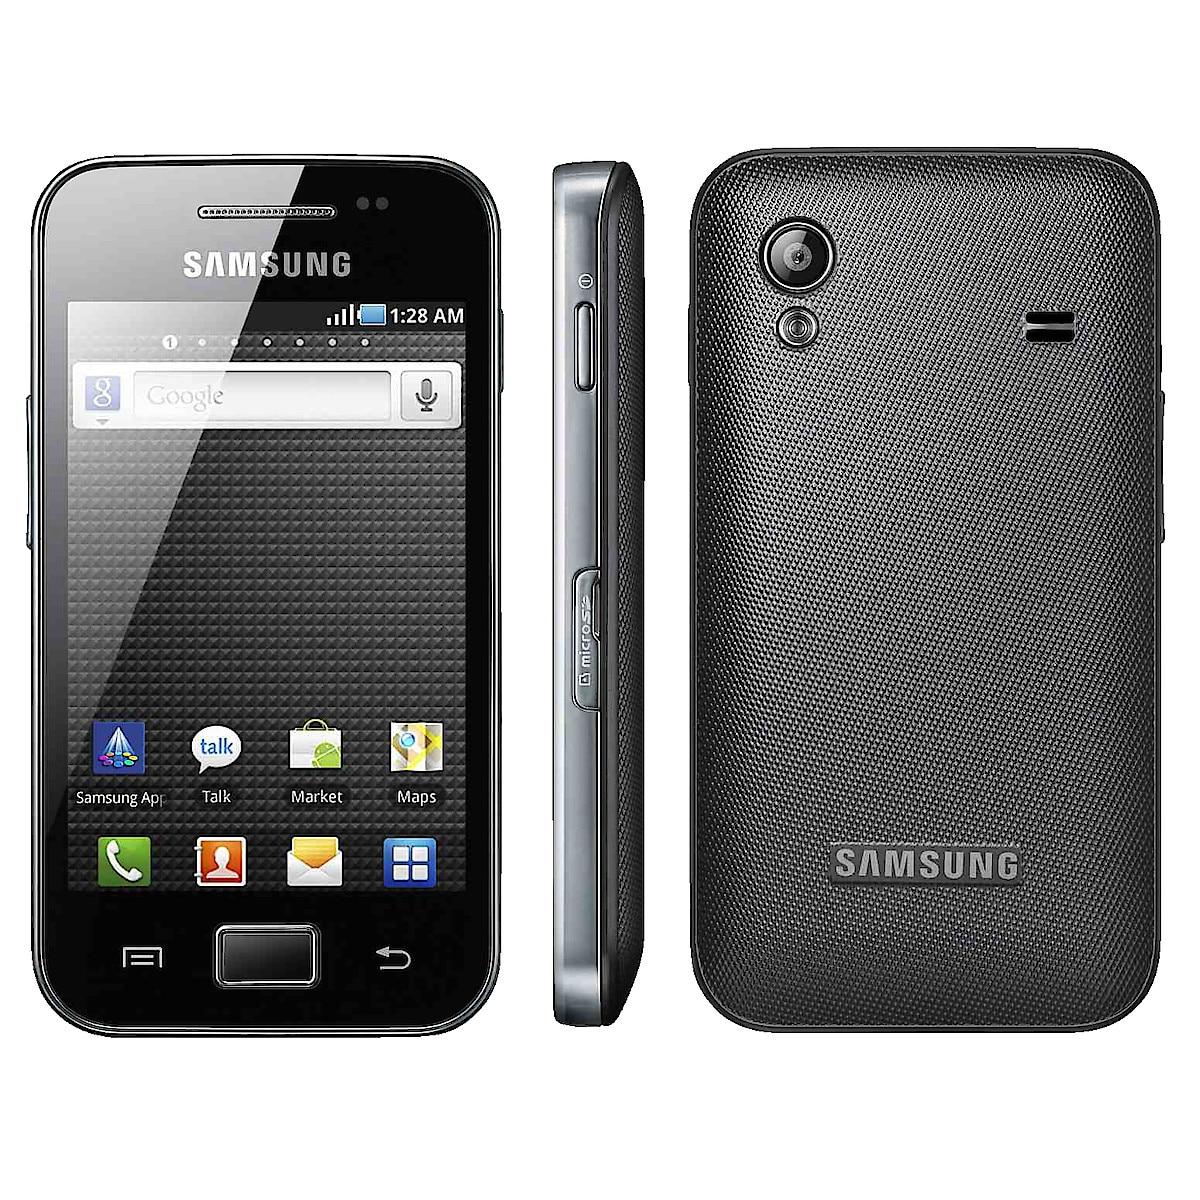 Galaxy Ace mobiltelefon